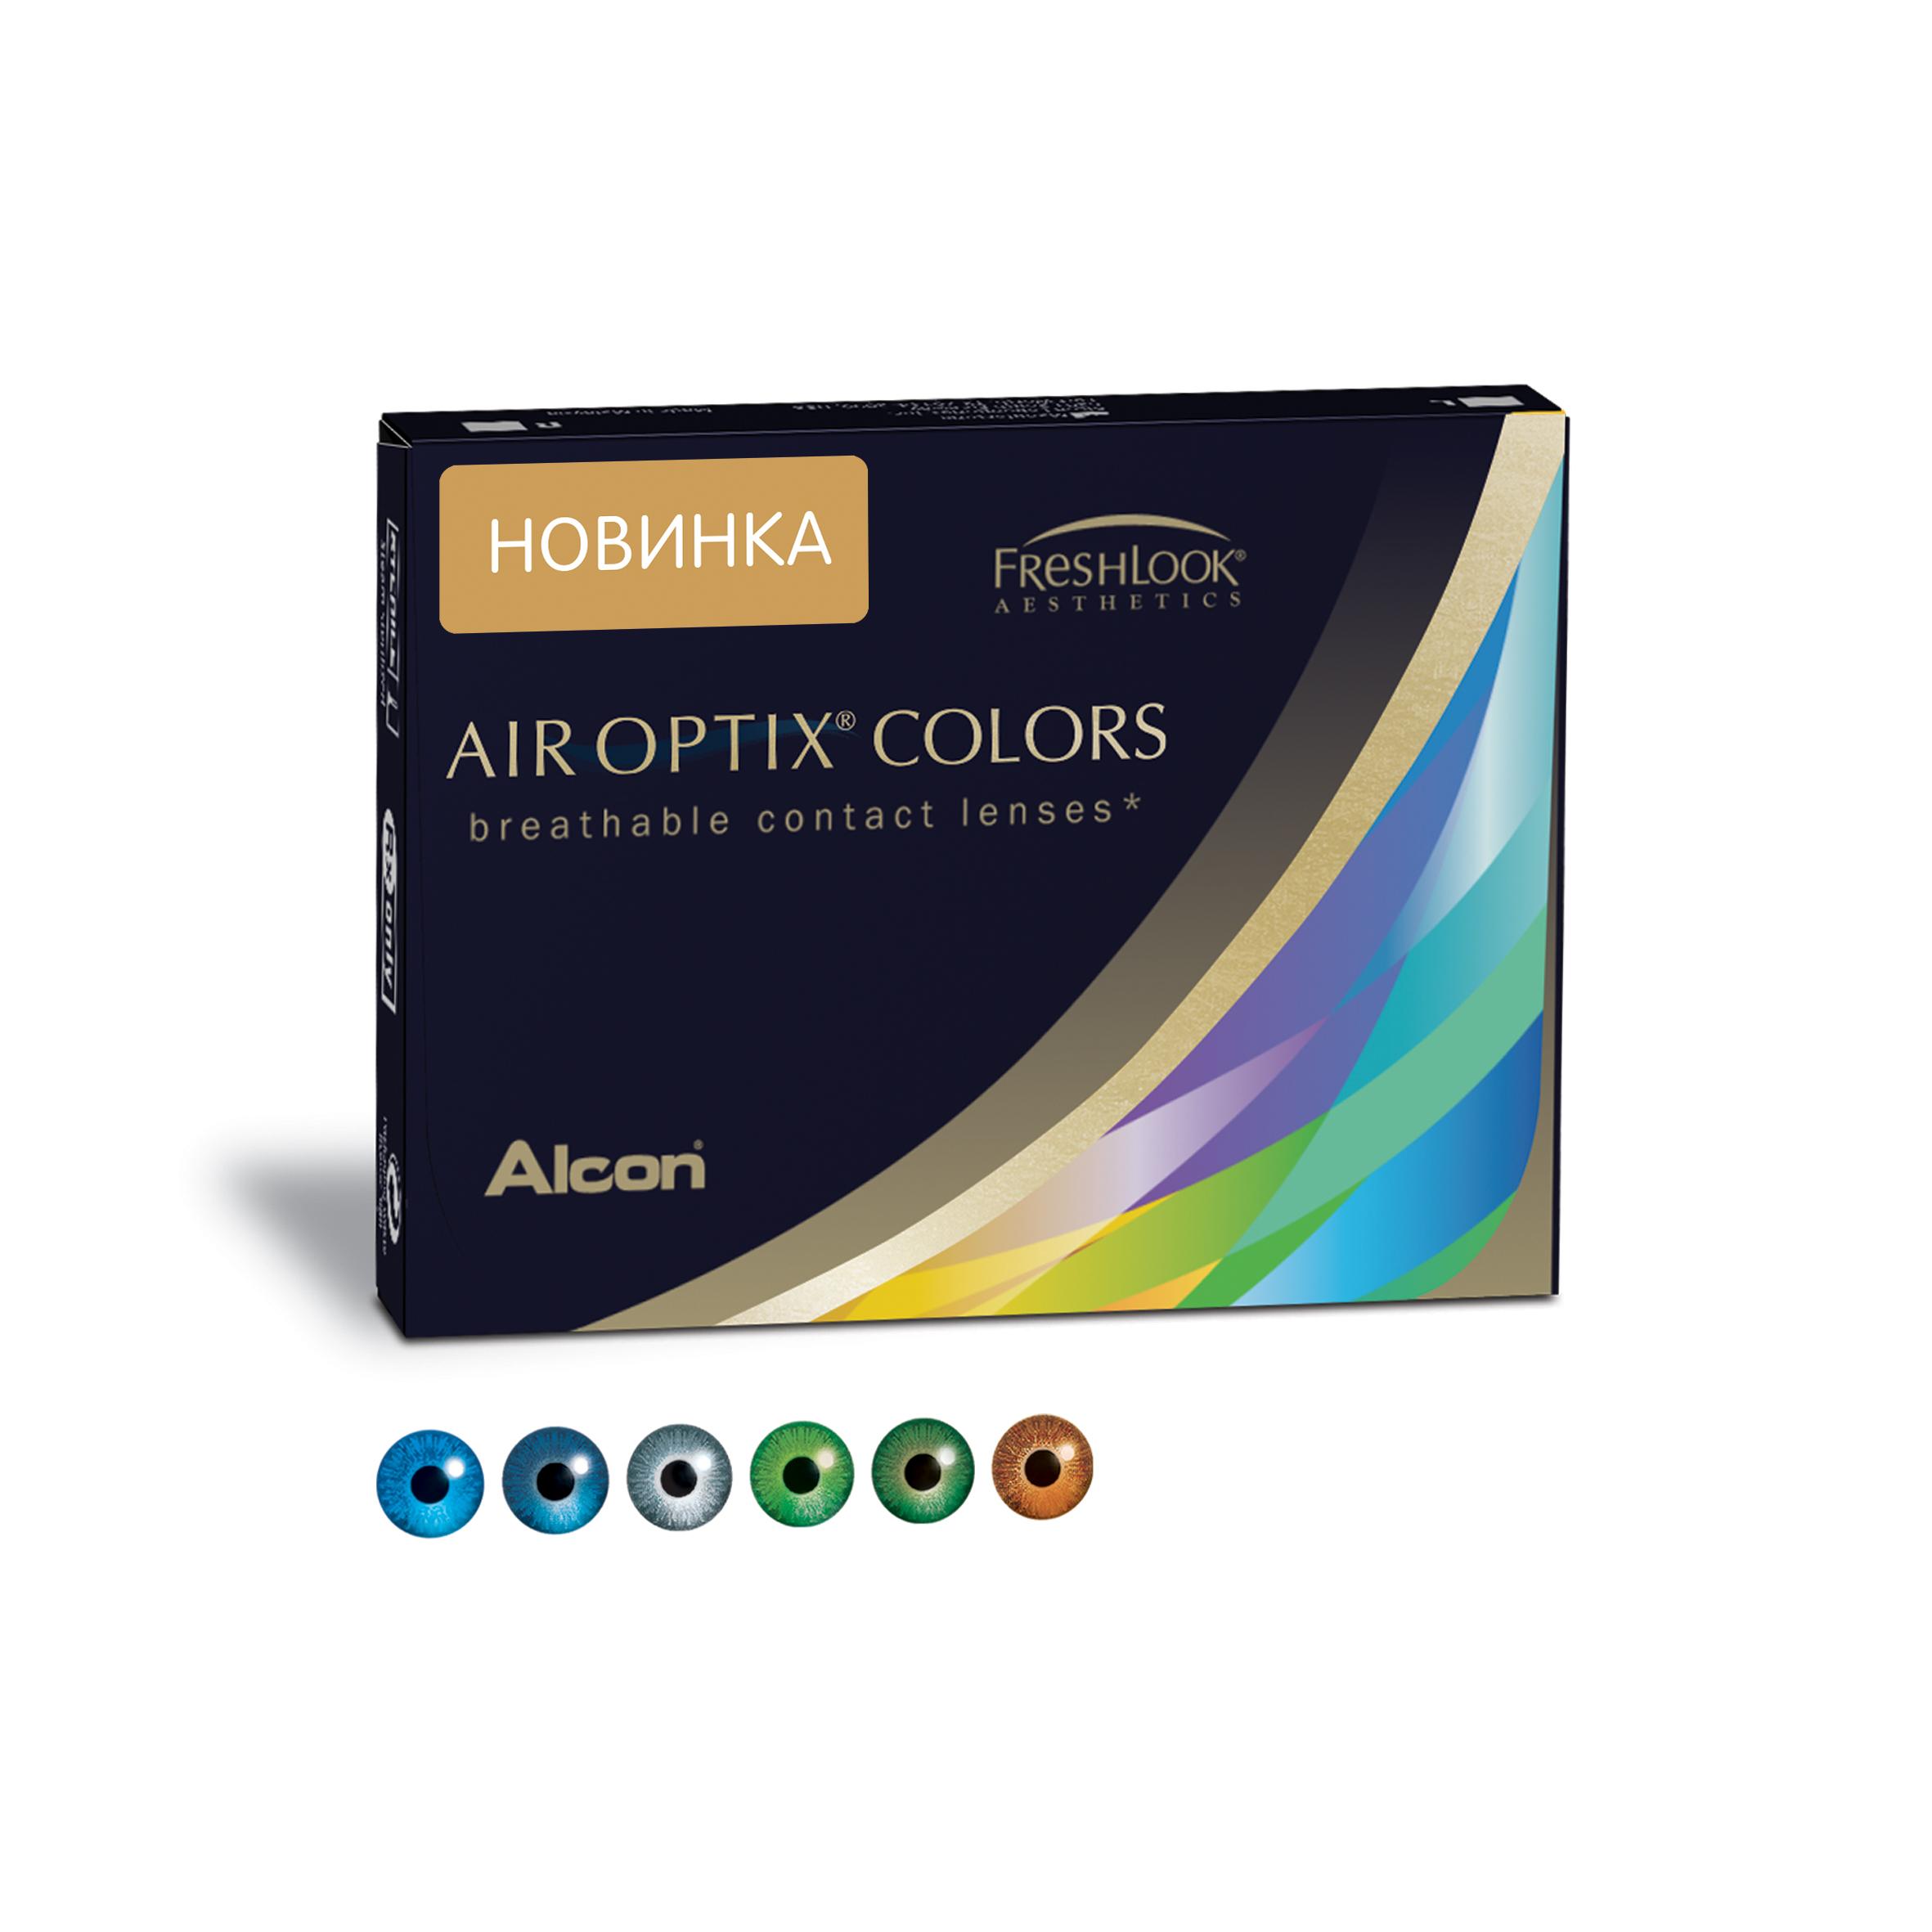 Аlcon контактные линзы Air Optix Colors 2 шт -4.00 Blue31746229Мягкие контактные линзы